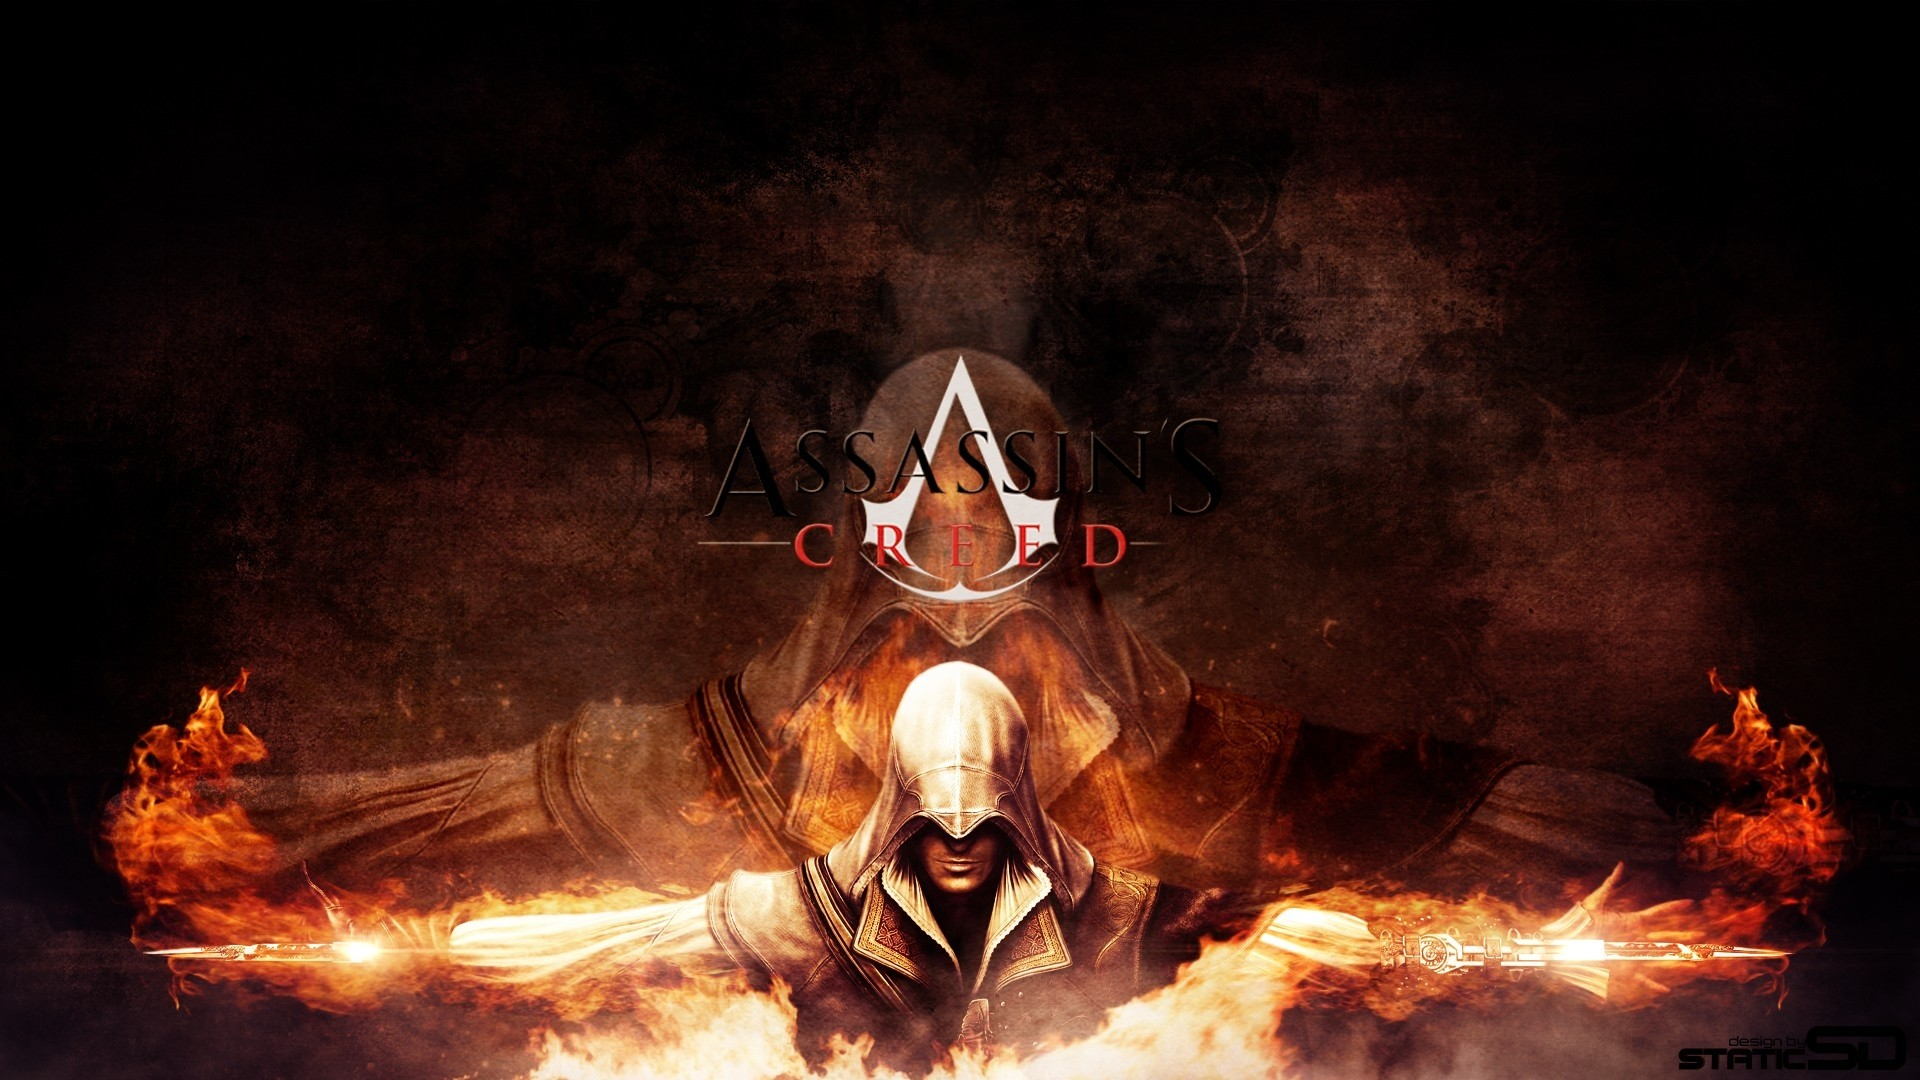 Wallpaper assassins creed, desmond miles, fire, assassins symbol,  game, name